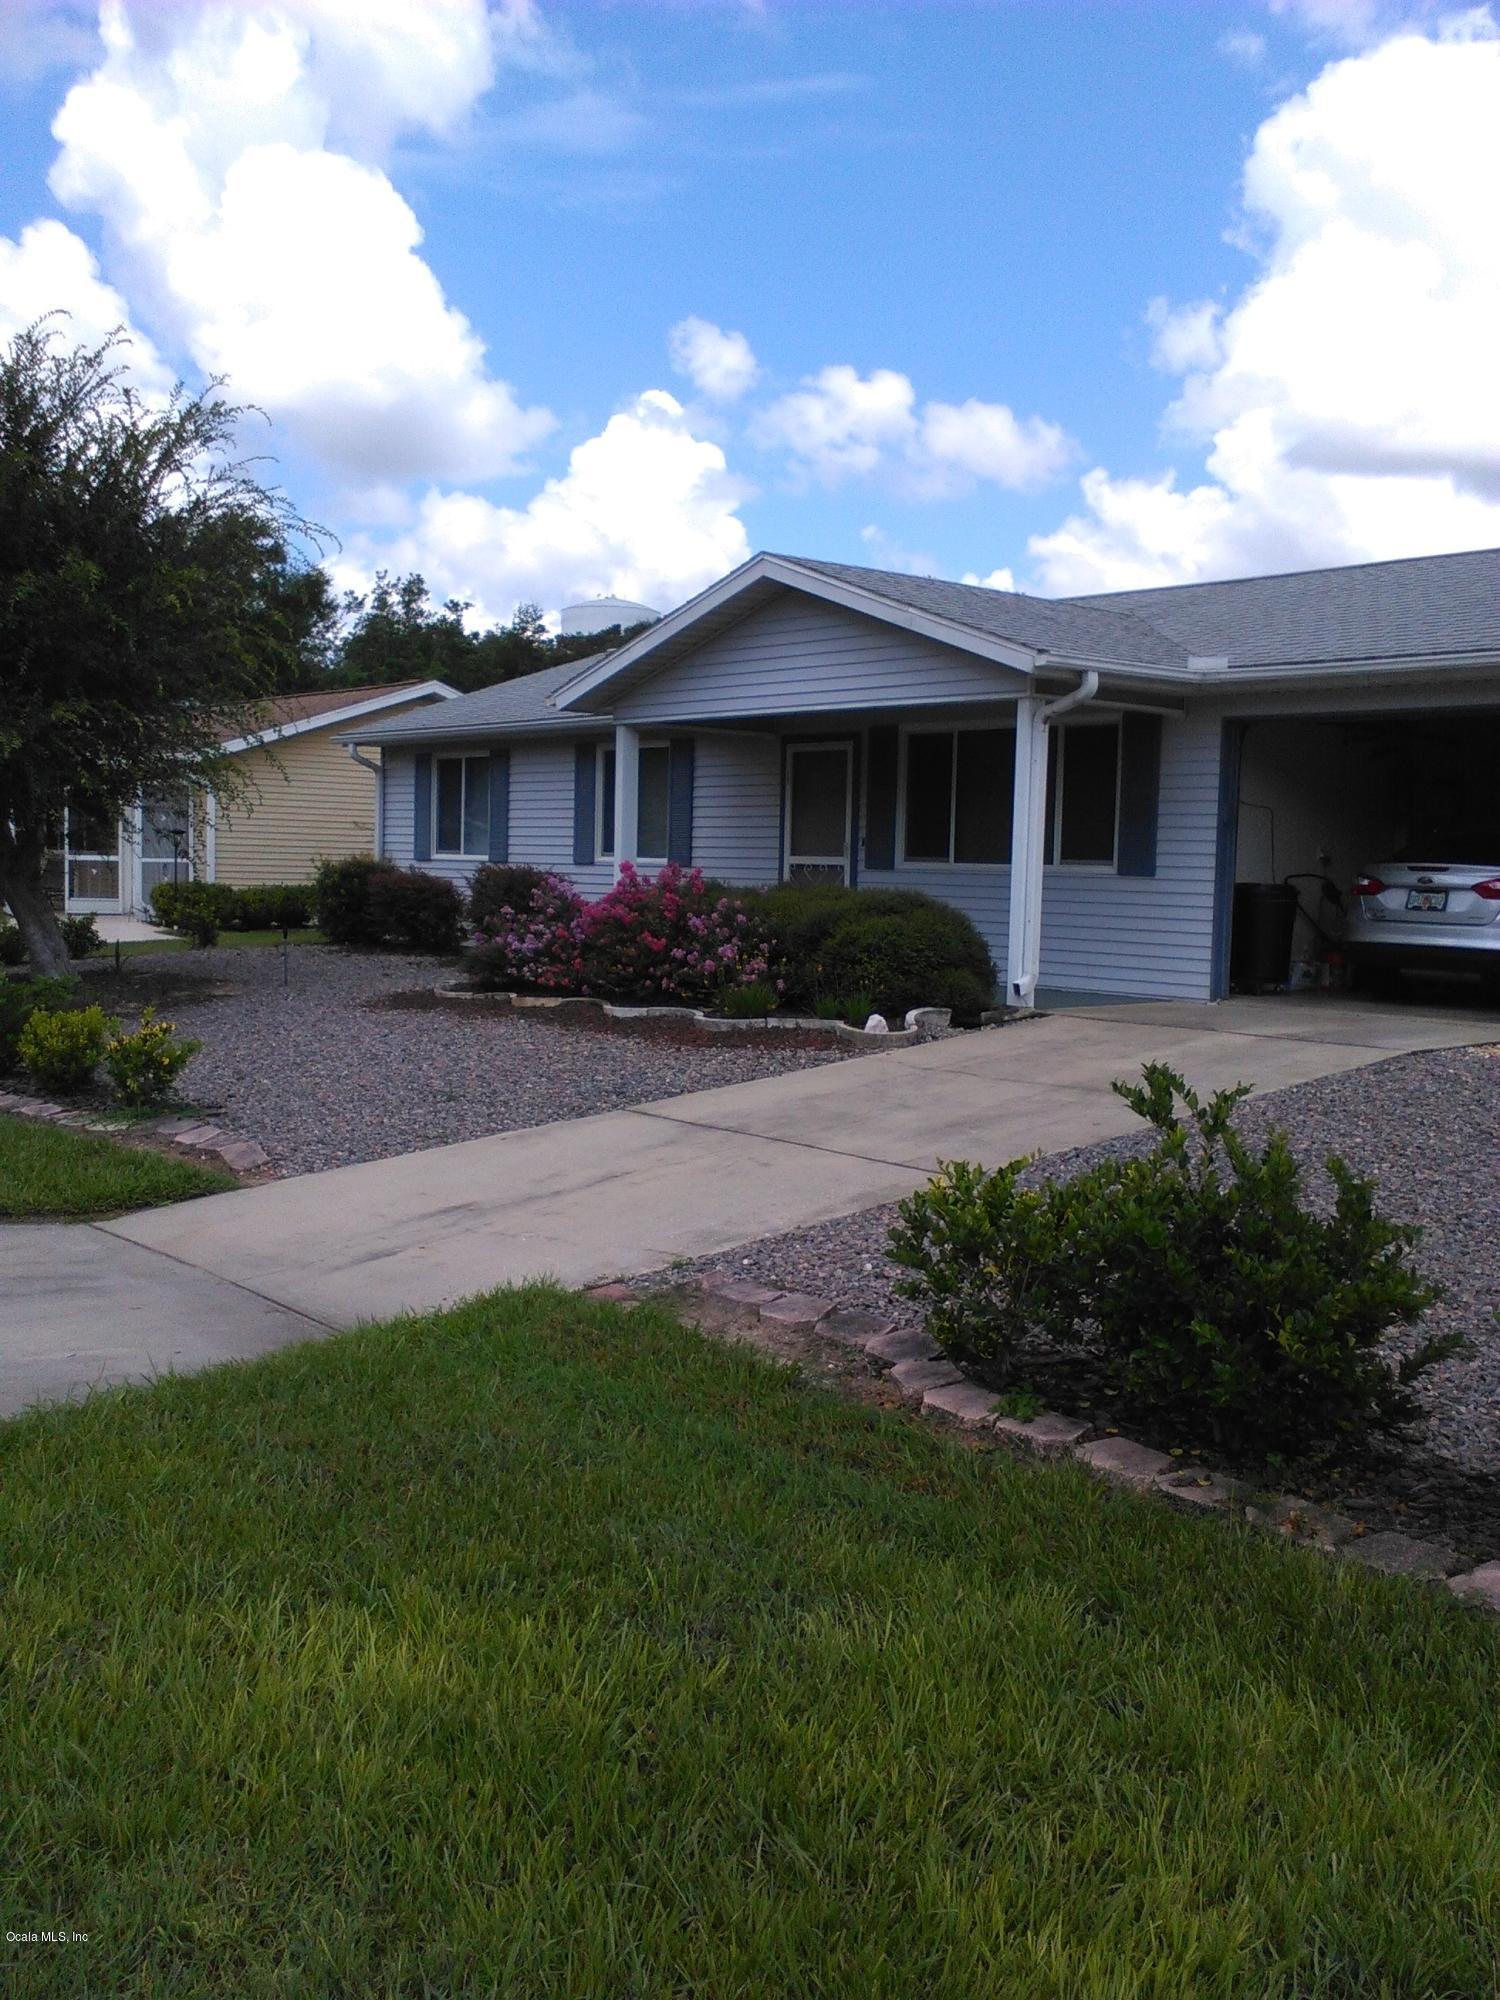 8543 SW 109TH STREET, OCALA, FL 34481